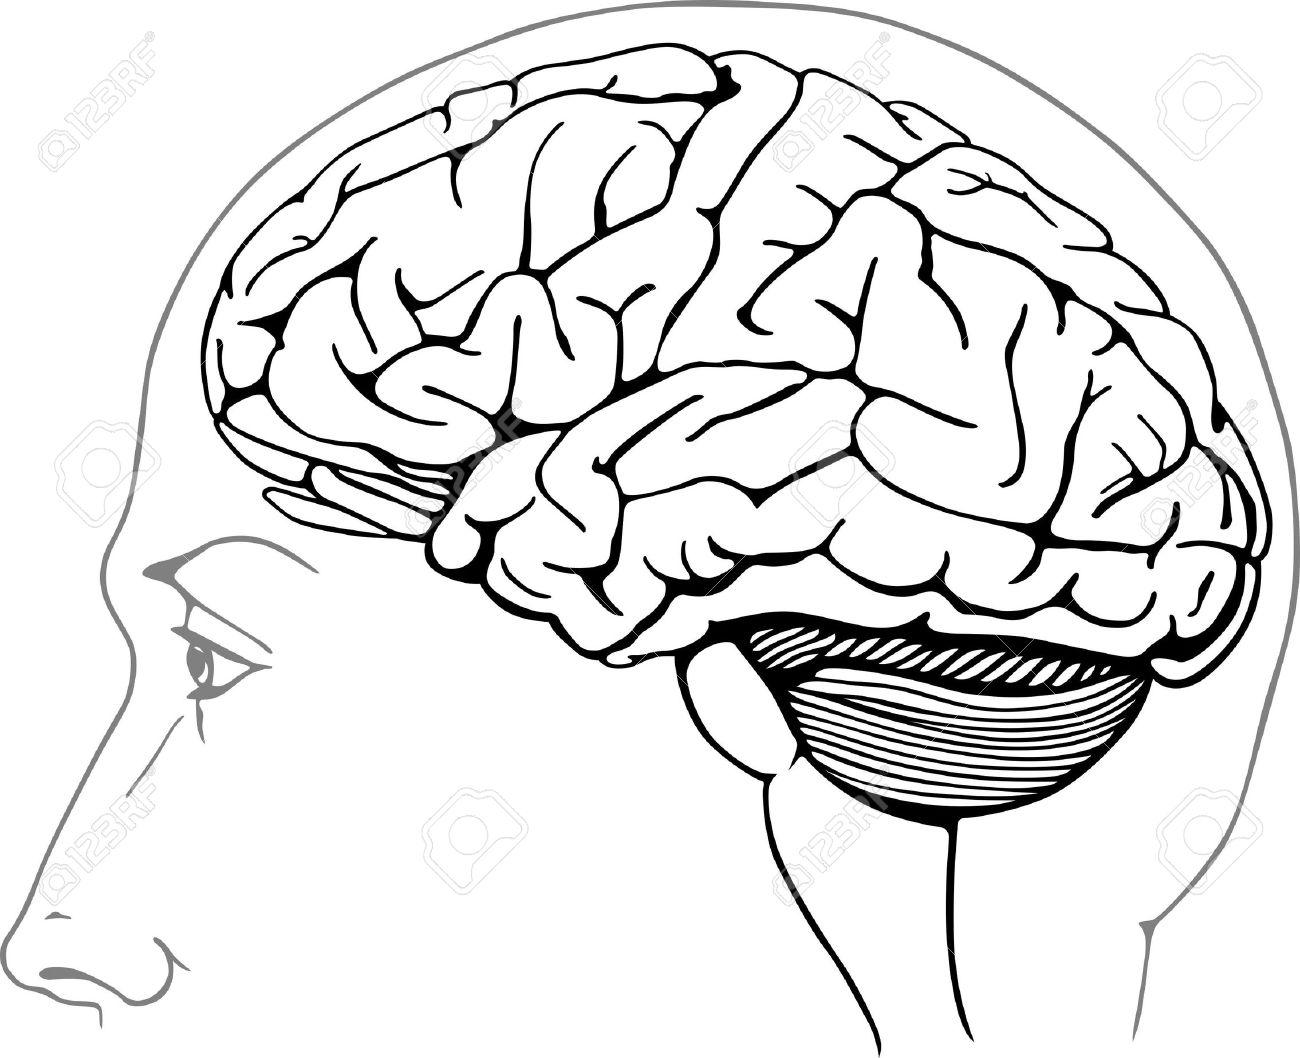 Human brain Stock Vector - 14687000